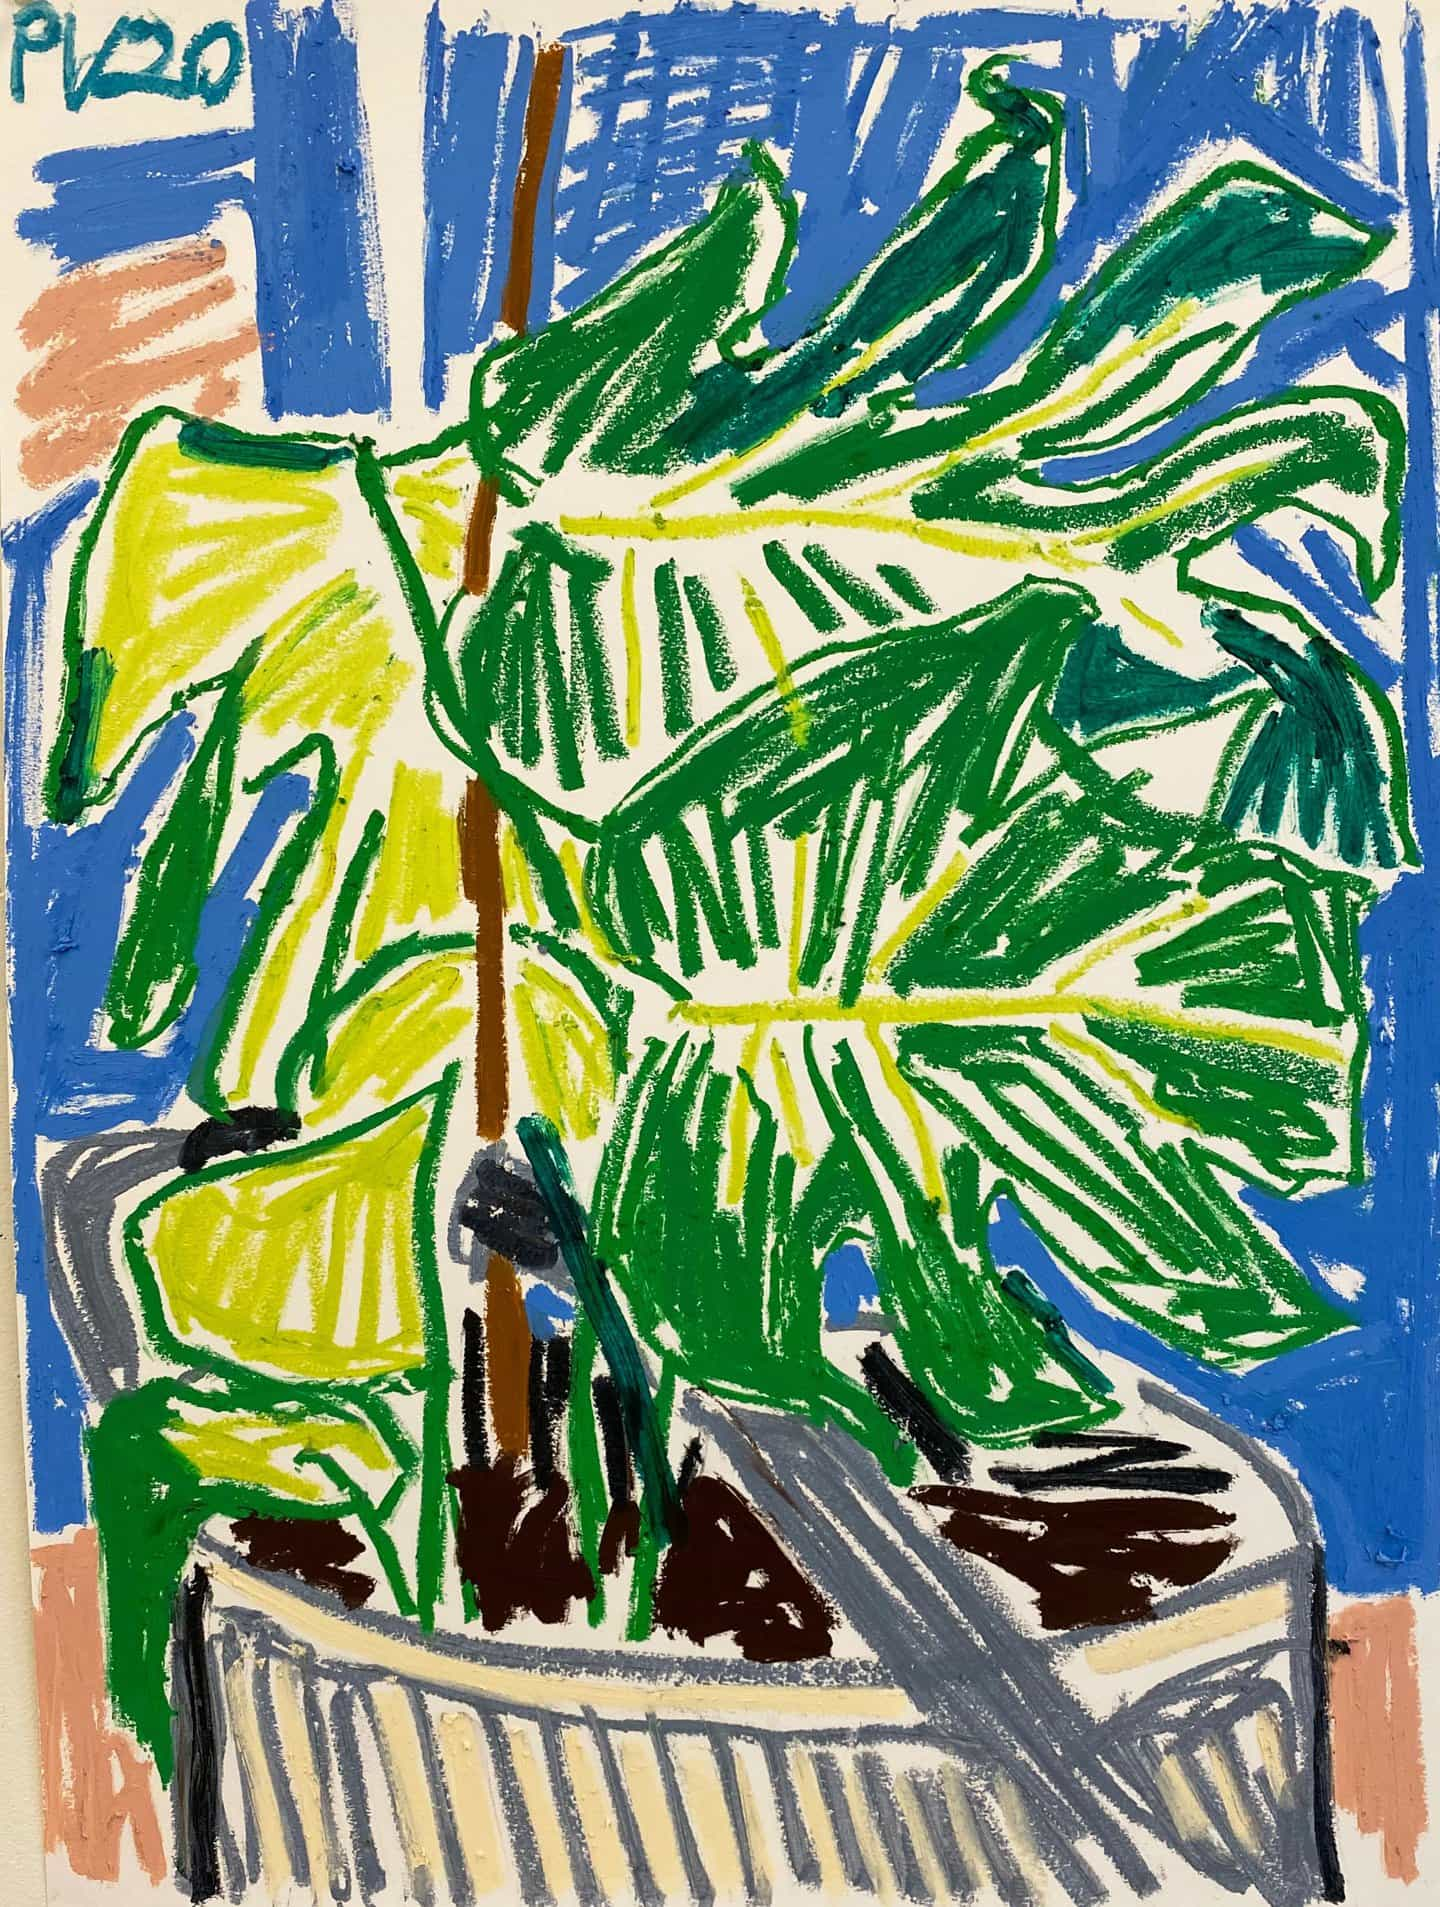 Paul Verdell: Planta dentada (Copyright © Paul Verdell, 2020)